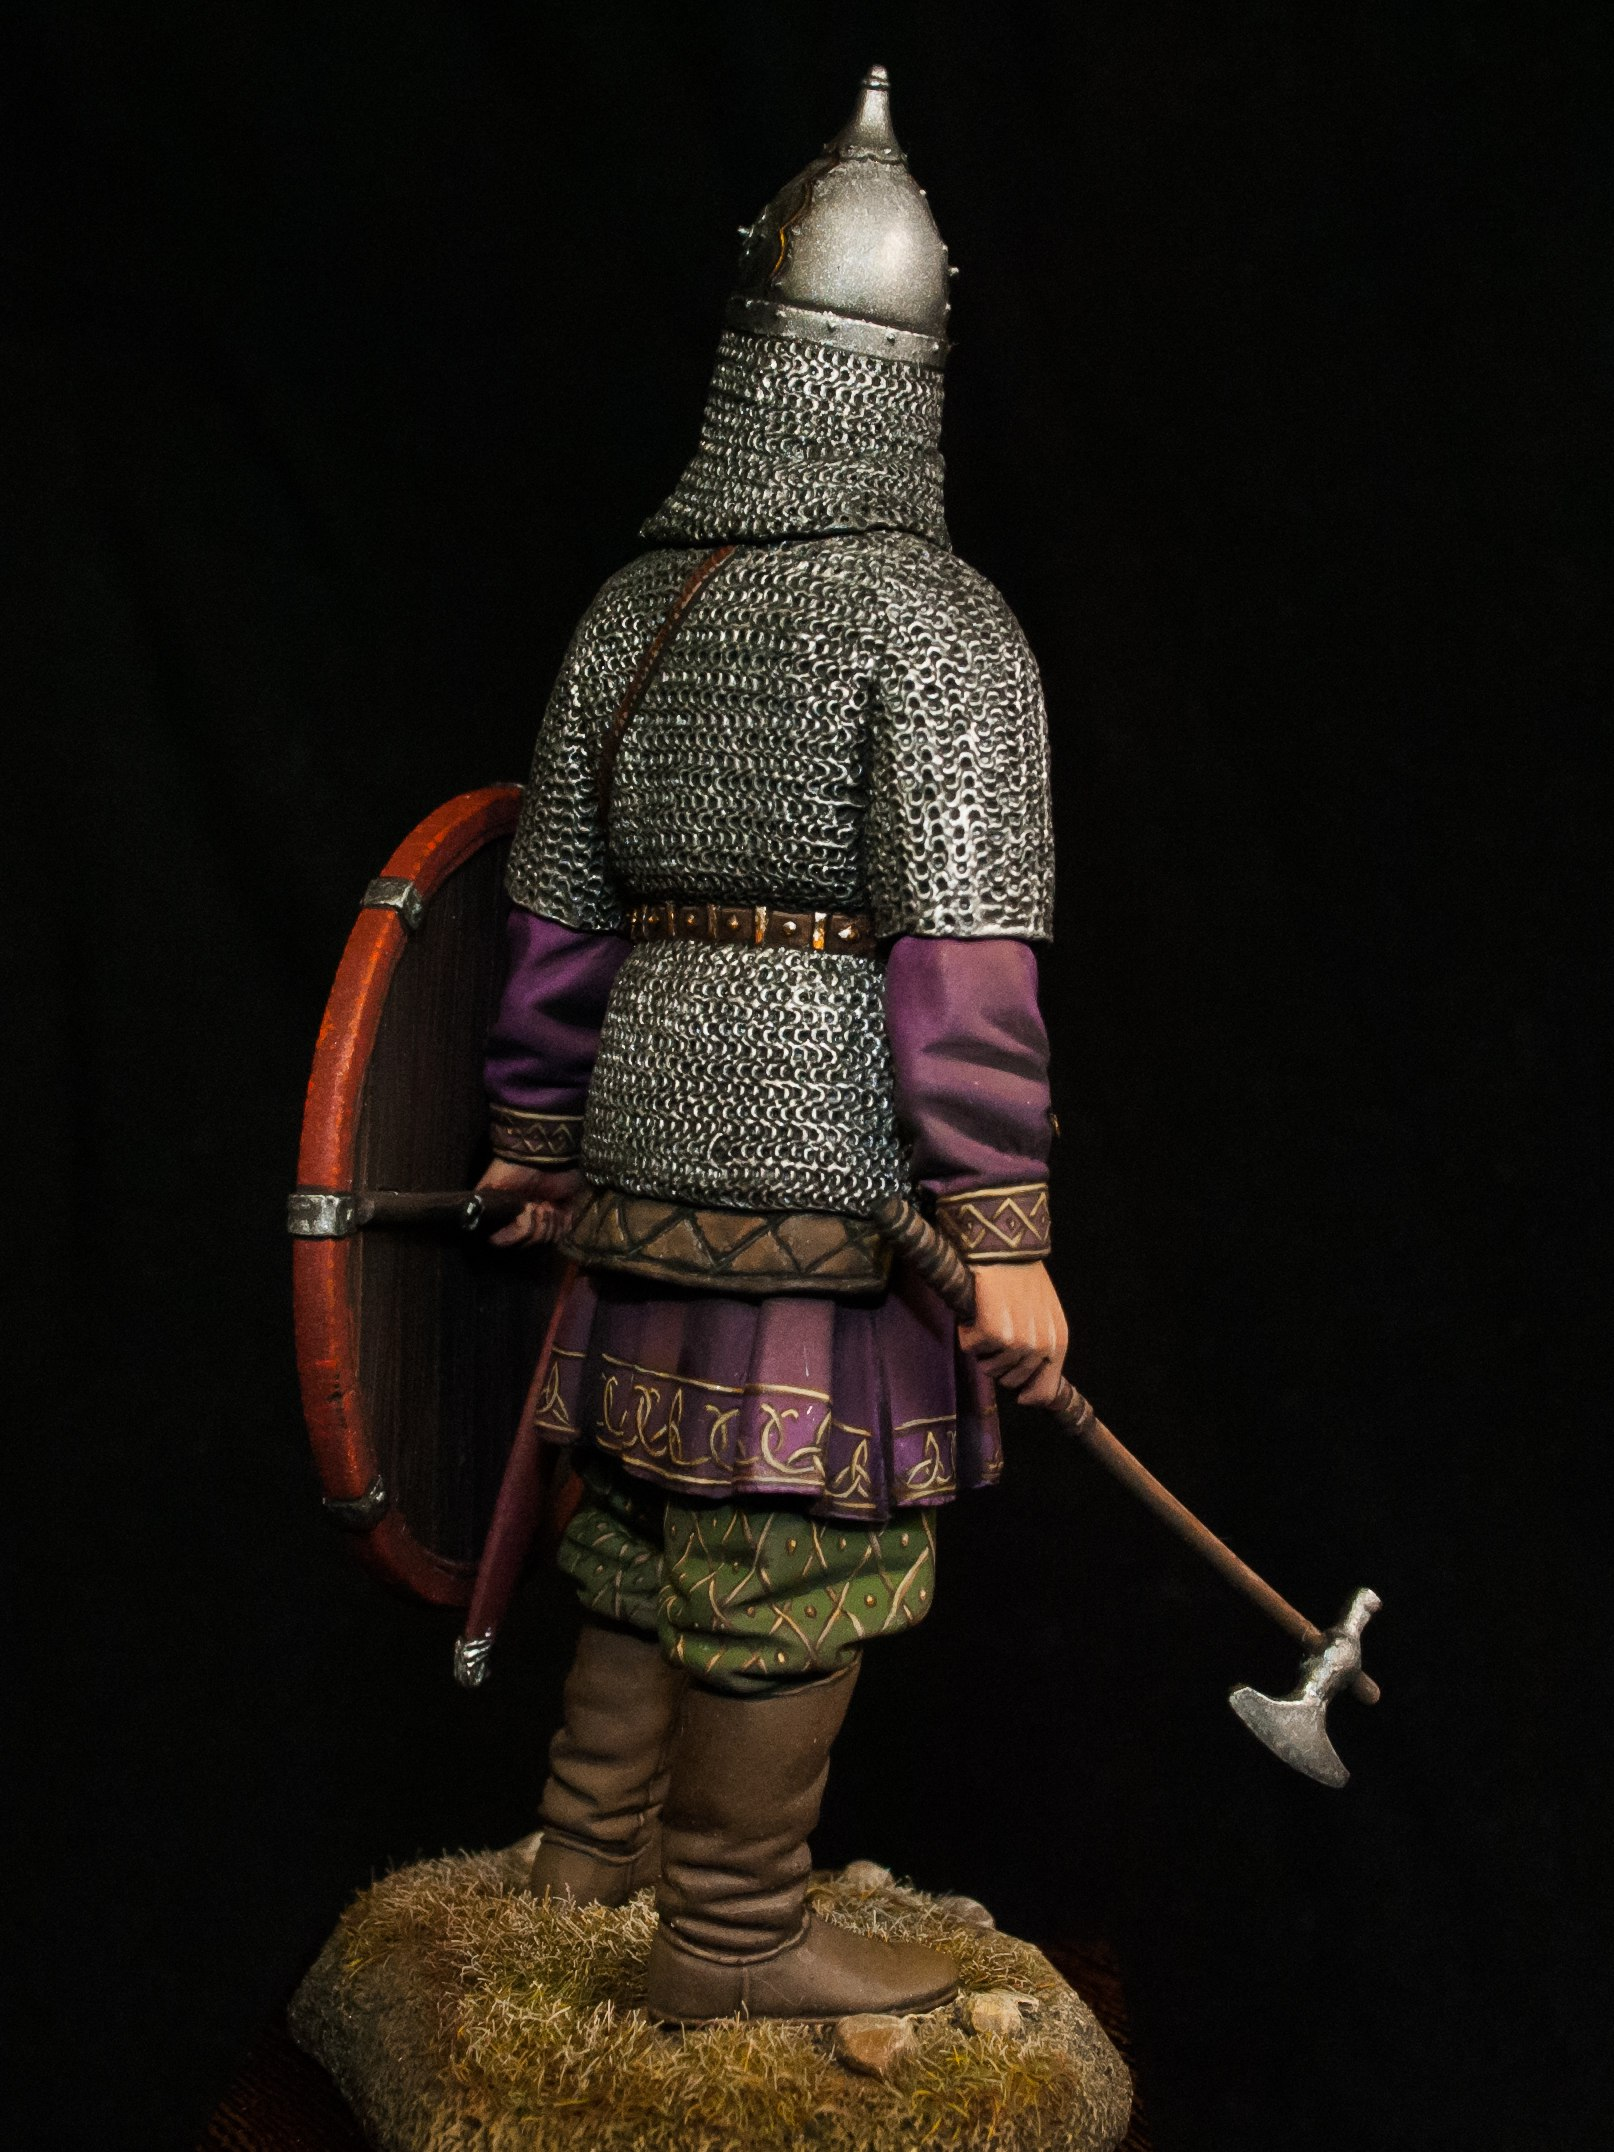 Russian Warrior